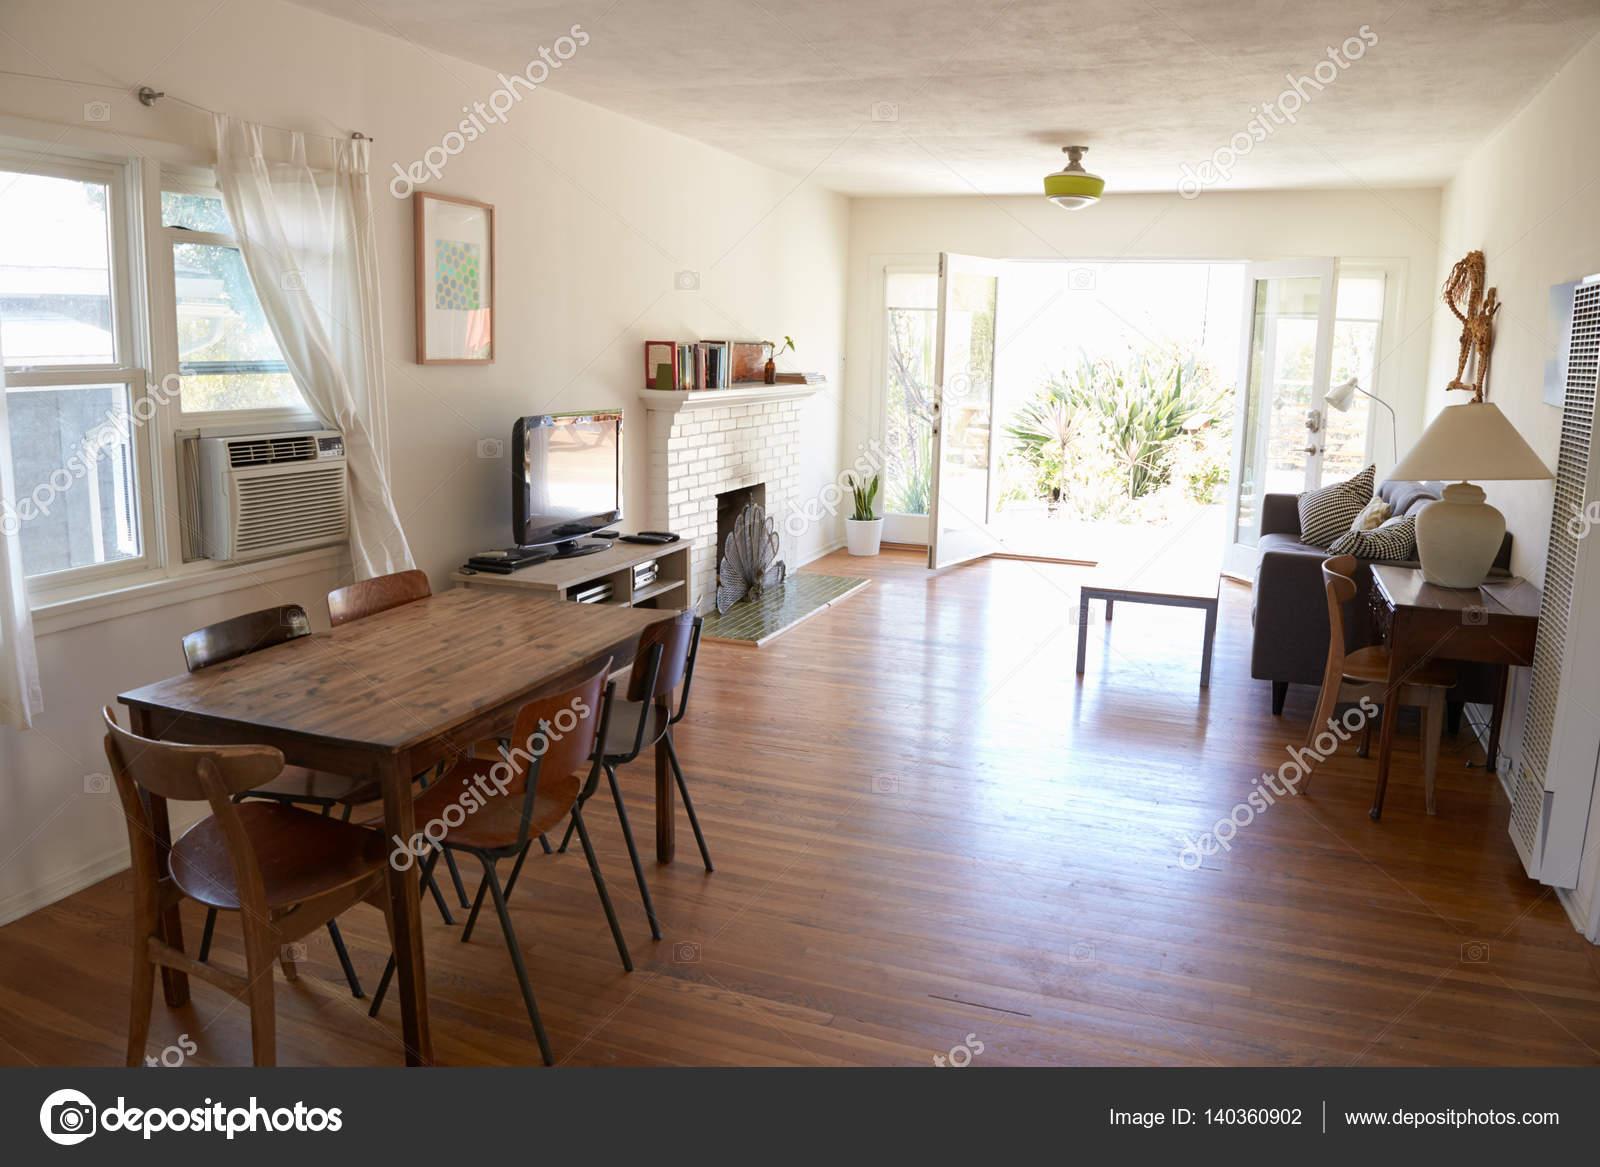 Interieur van moderne lounge u2014 stockfoto © monkeybusiness #140360902